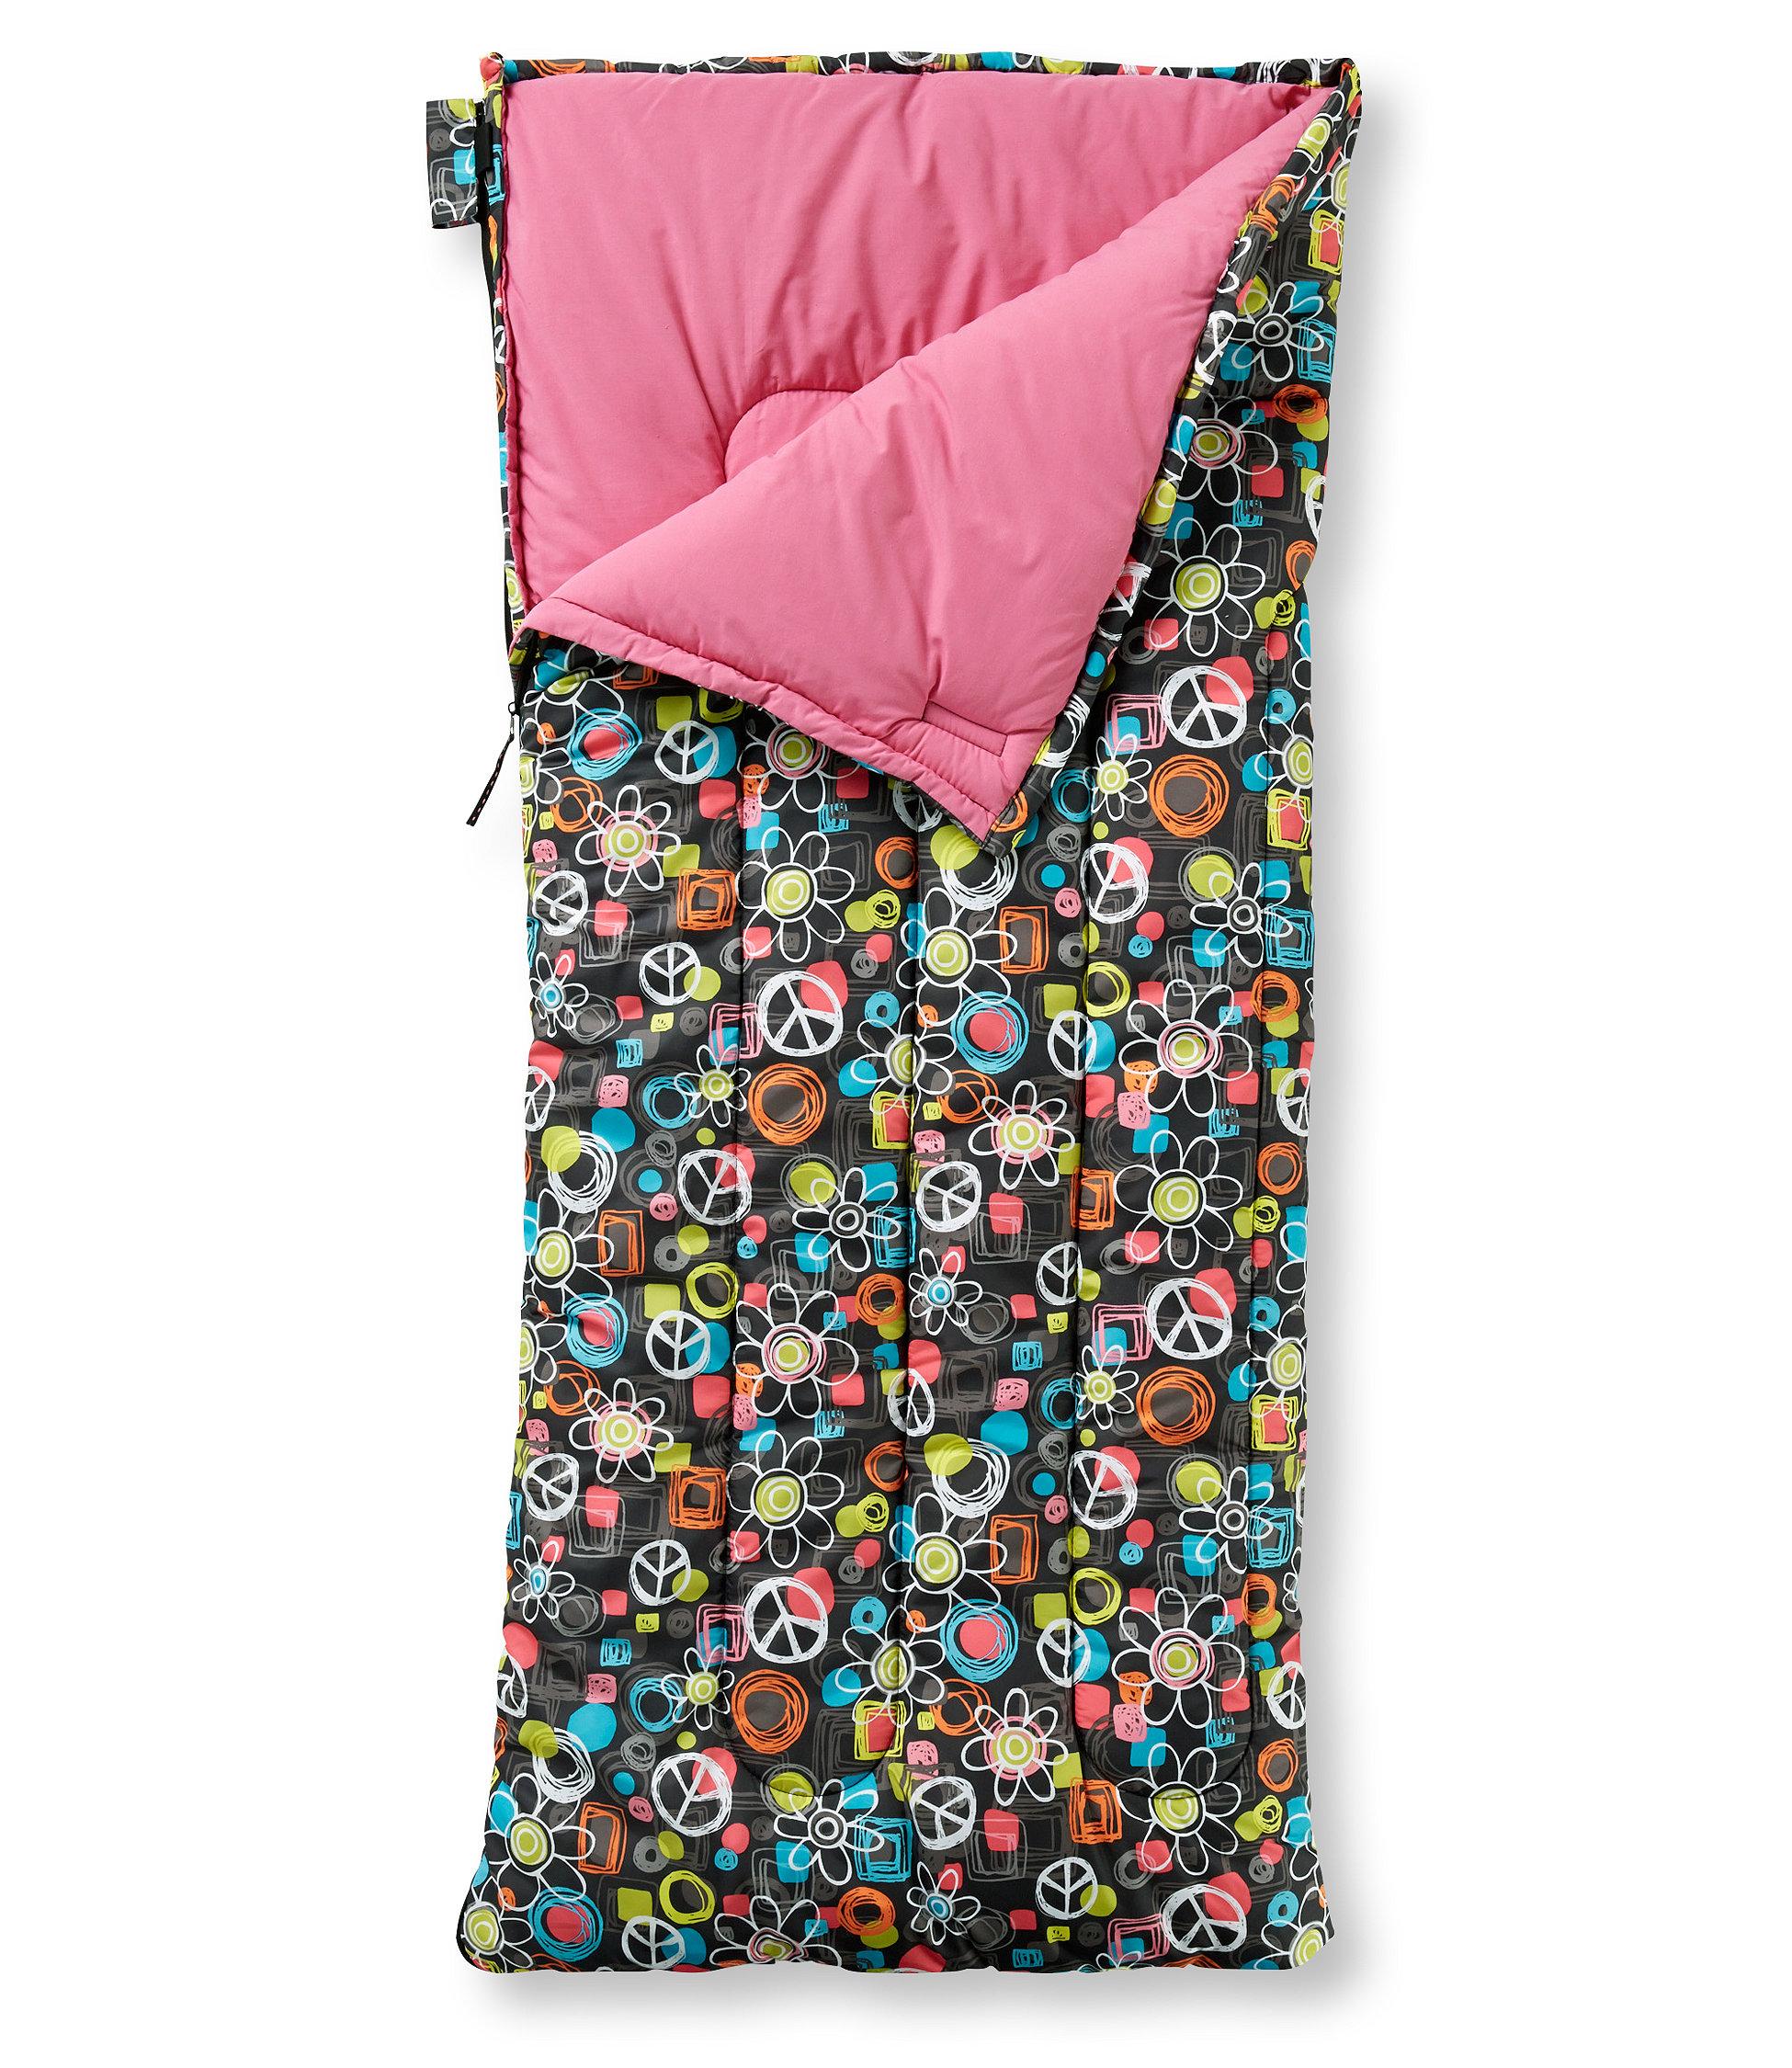 284929 Camp Sleeping Bag, Kids' Graphic 40° chalkboard peace